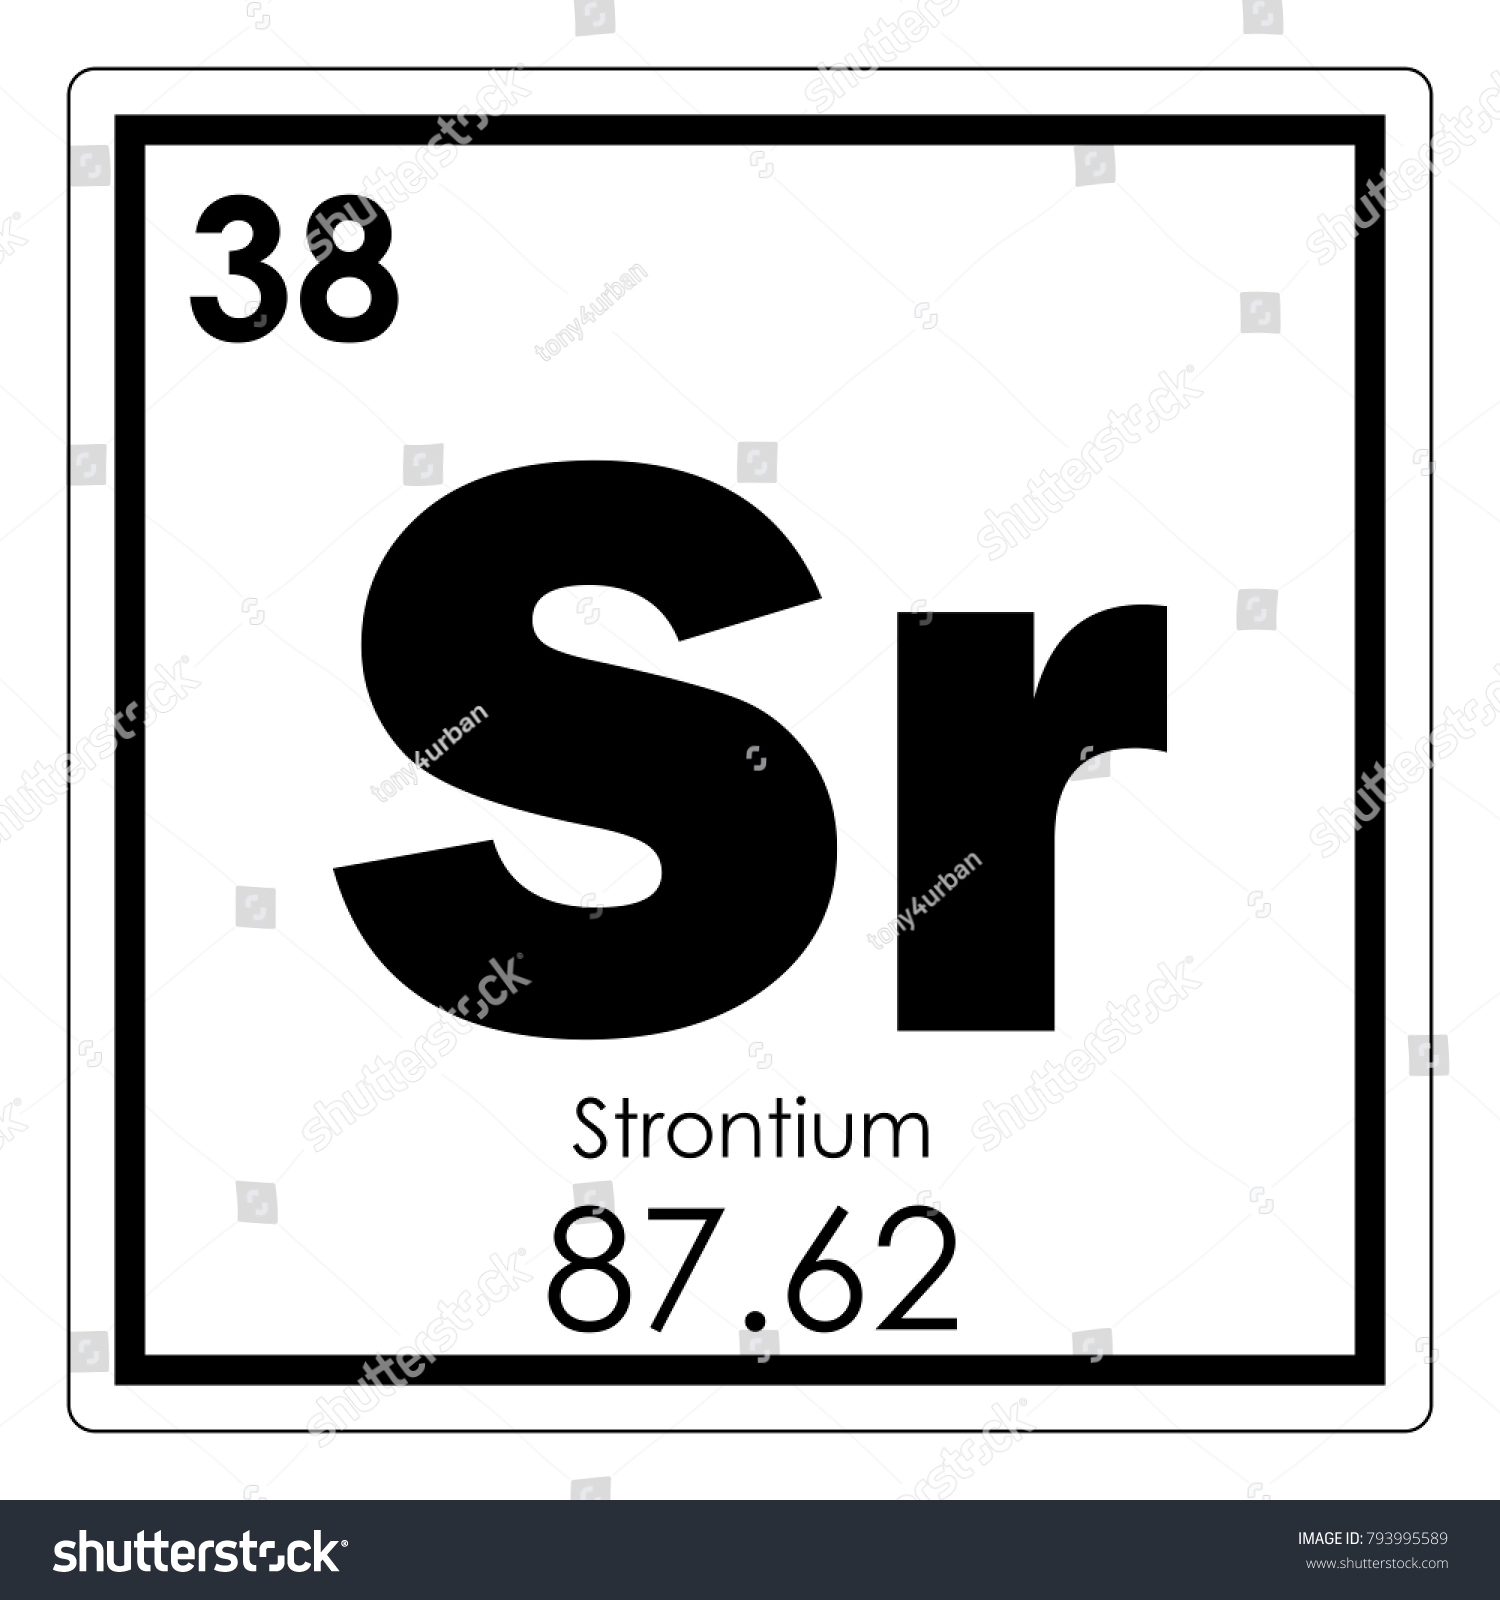 Strontium chemical element periodic table science stock strontium chemical element periodic table science symbol biocorpaavc